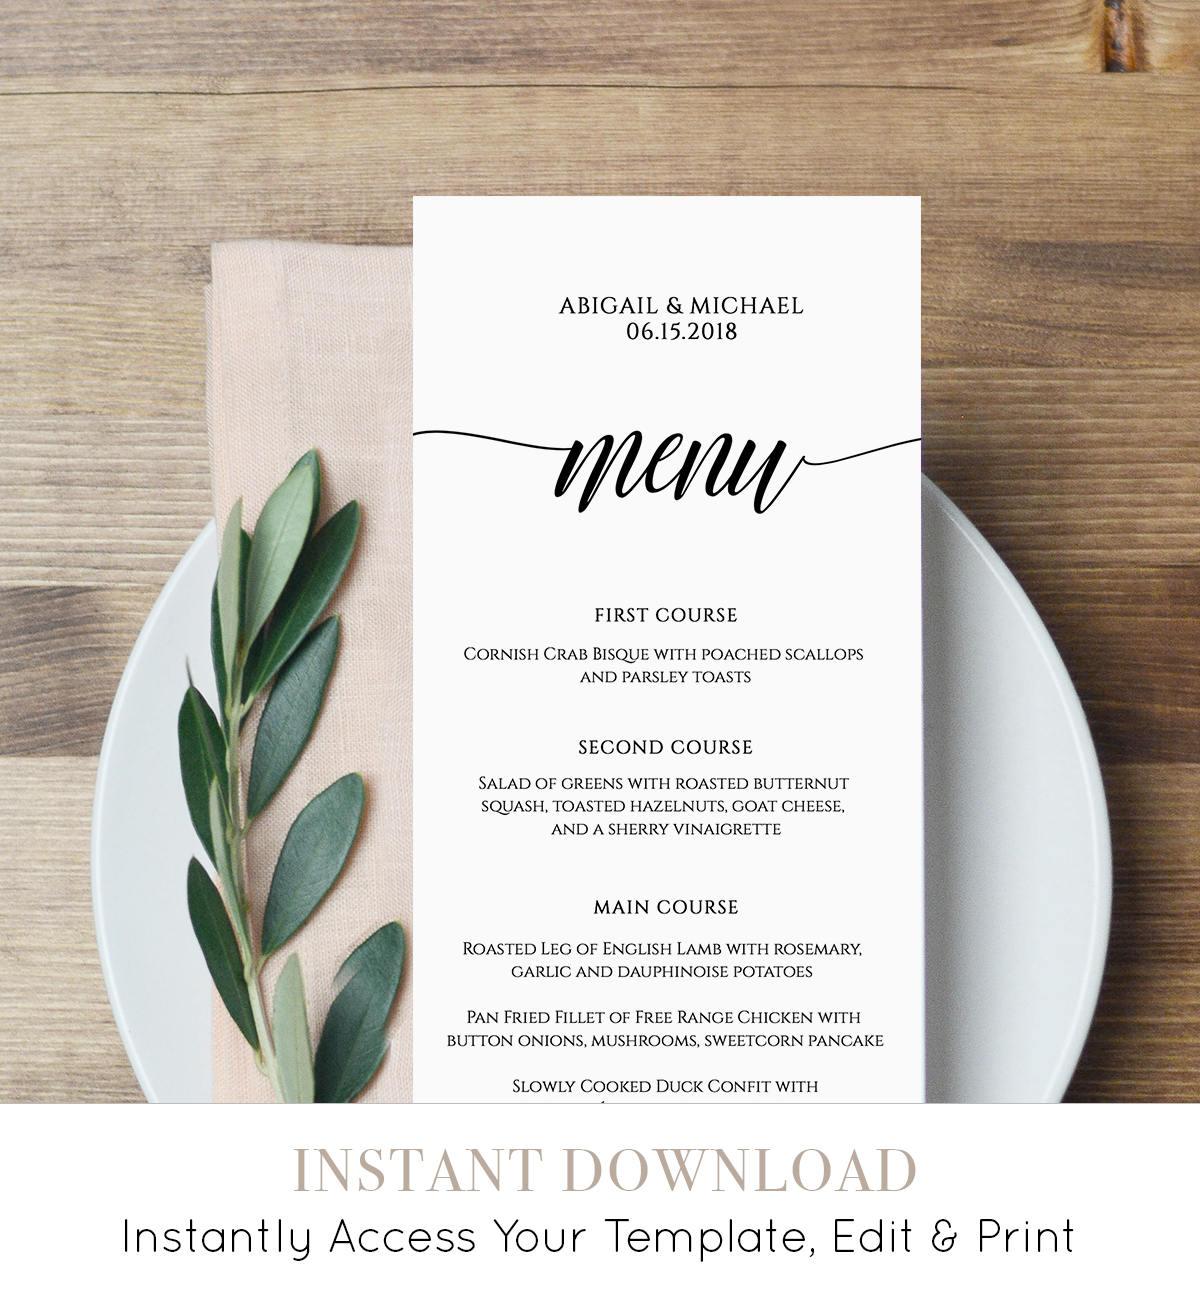 menu card template rustic dinner menu wedding menu card. Black Bedroom Furniture Sets. Home Design Ideas